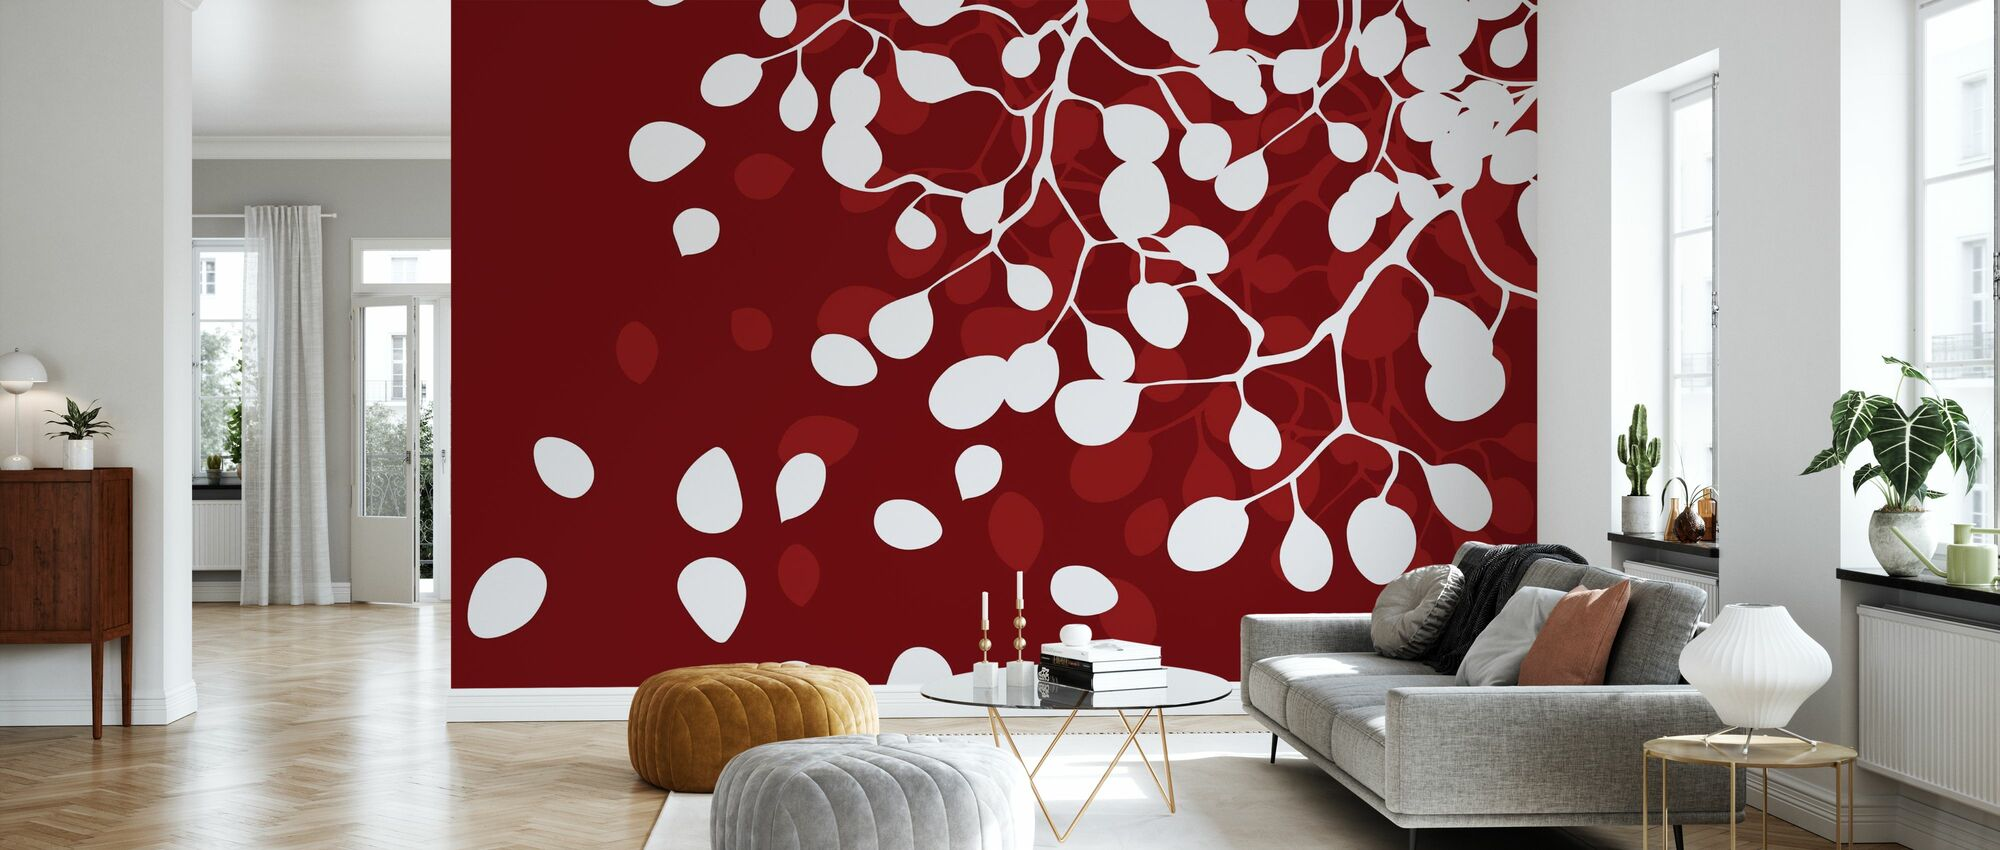 Birch - Holiday Red - Wallpaper - Living Room